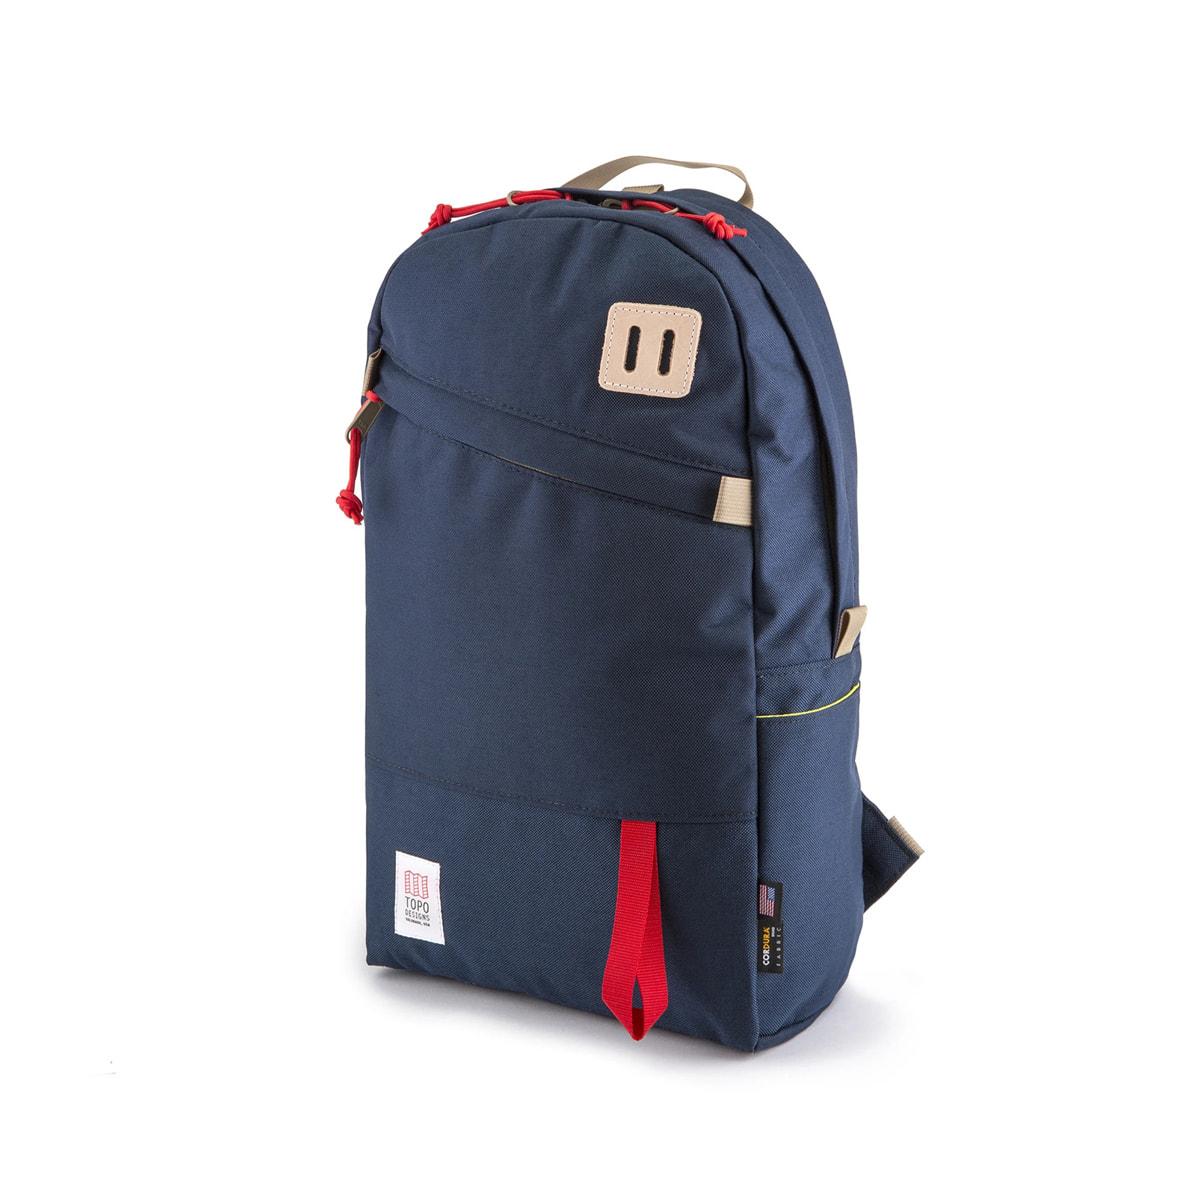 Everyday daypack